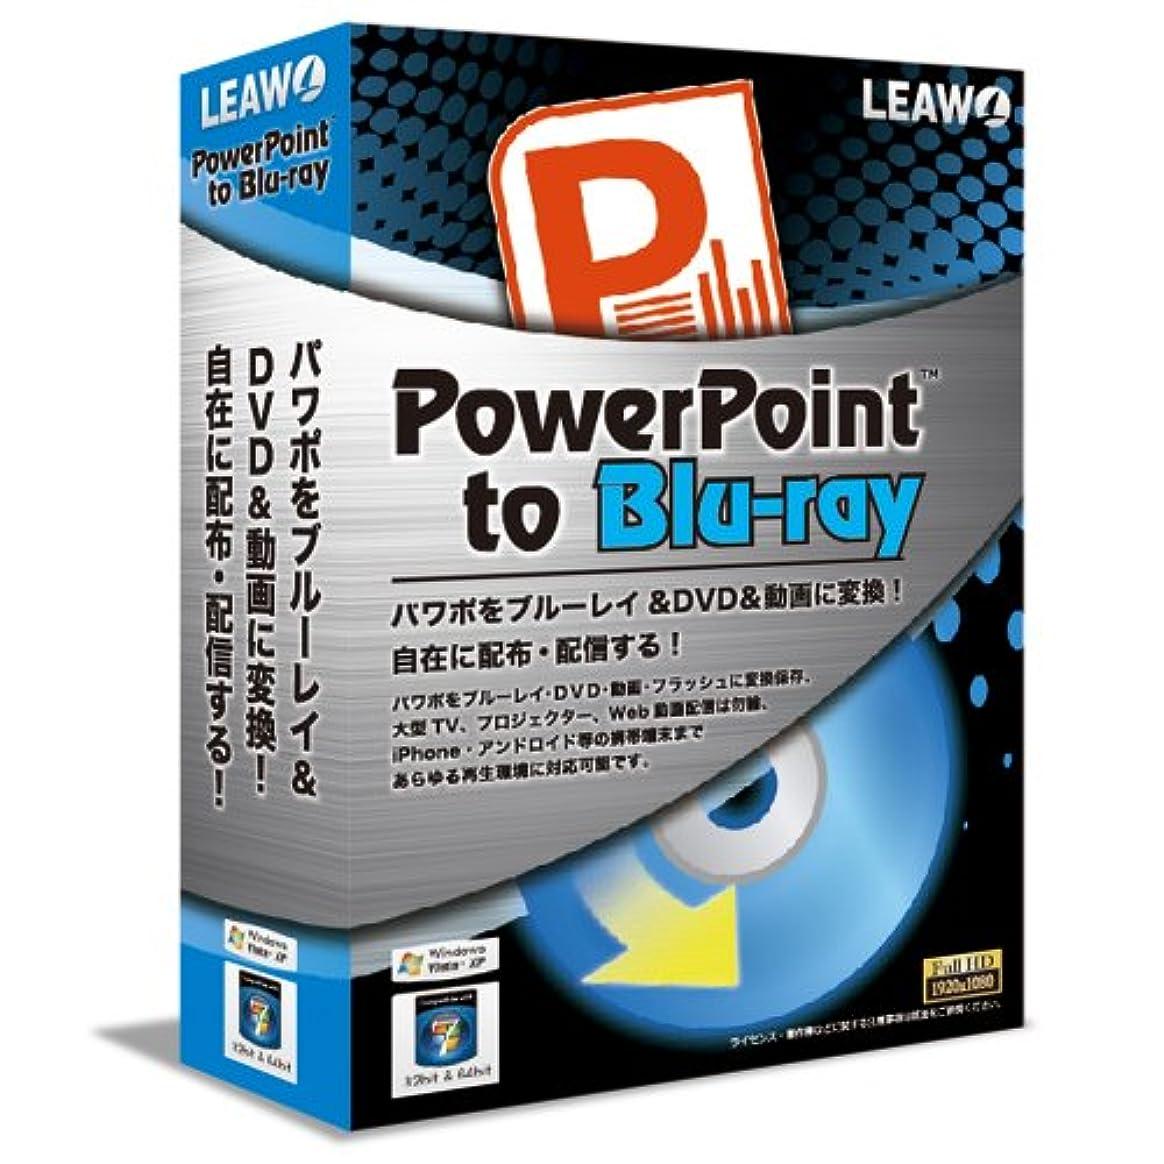 PowerPoint to Blu-Ray (パワーポイント トゥ ブルーレイ)